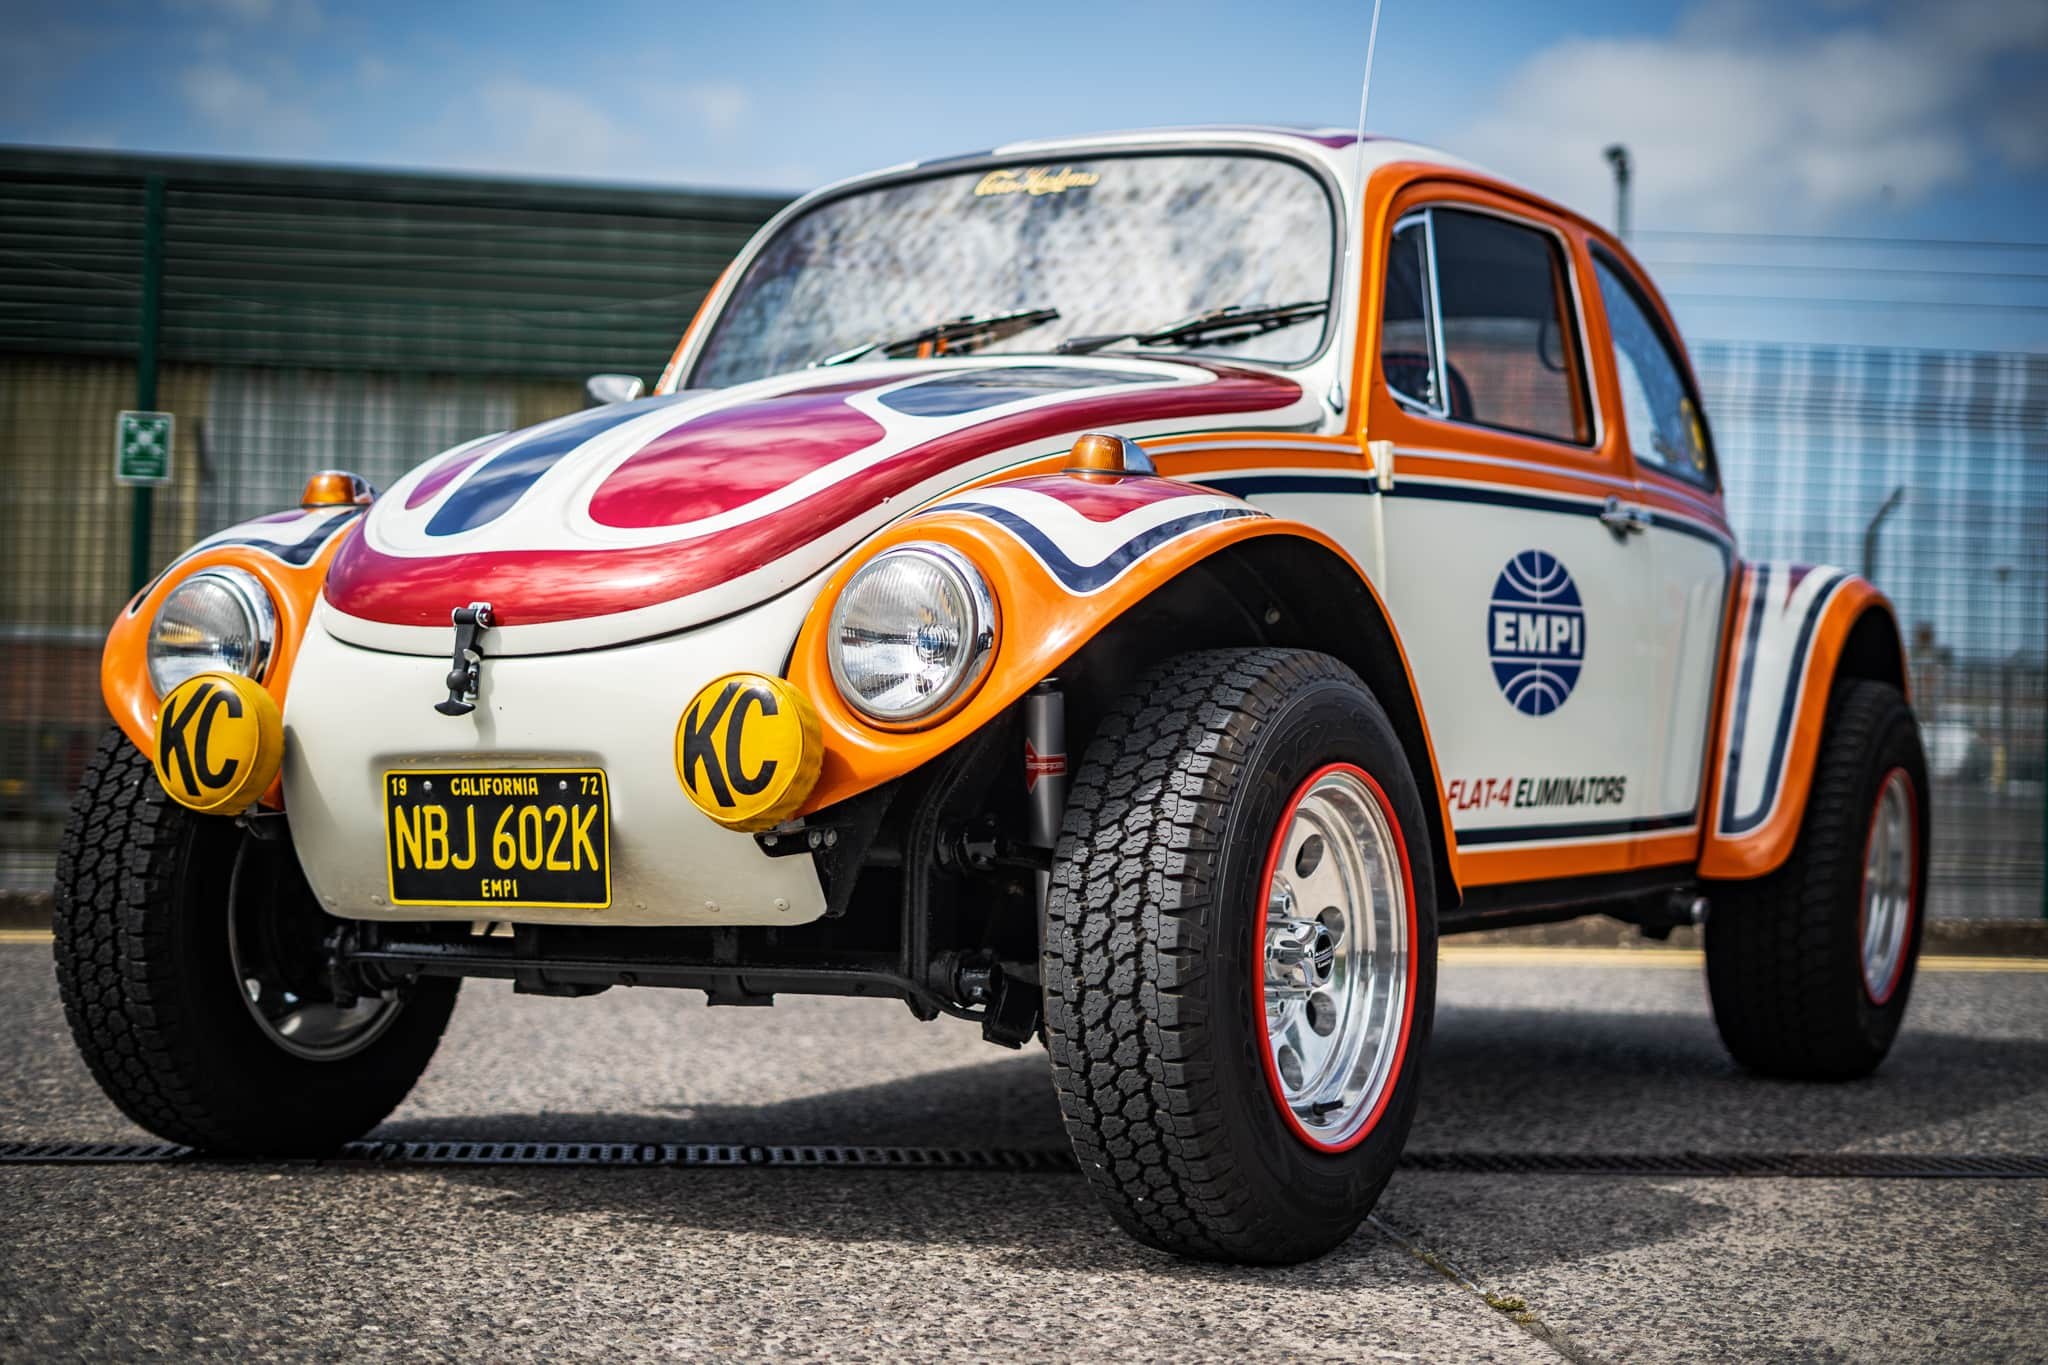 1972 VW Beetle - EMPI Inch Pincher Tribute Baja - 5th July